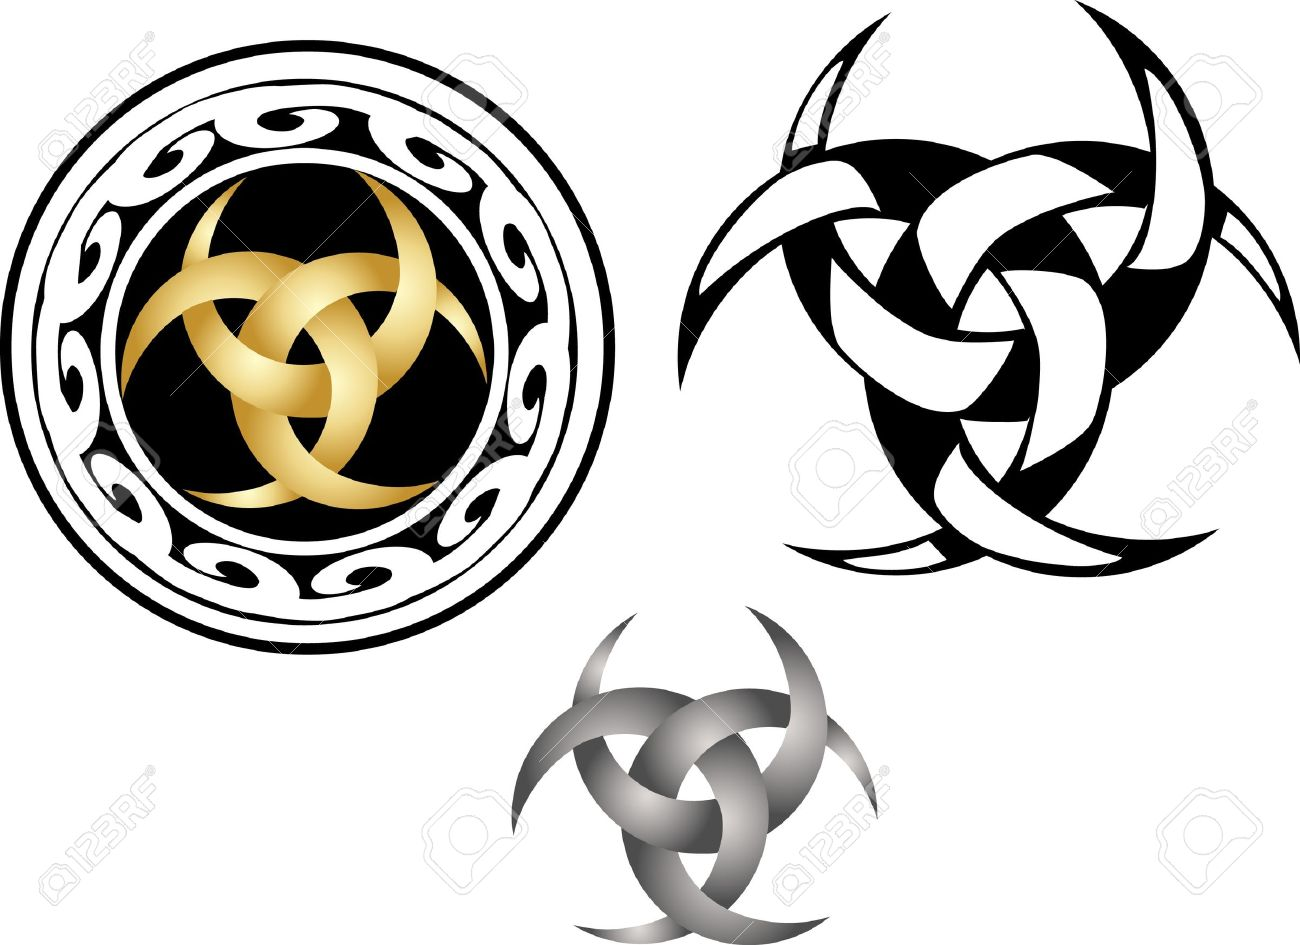 Moon talisman three intertwined crescents royalty free cliparts moon talisman three intertwined crescents stock vector 18699886 biocorpaavc